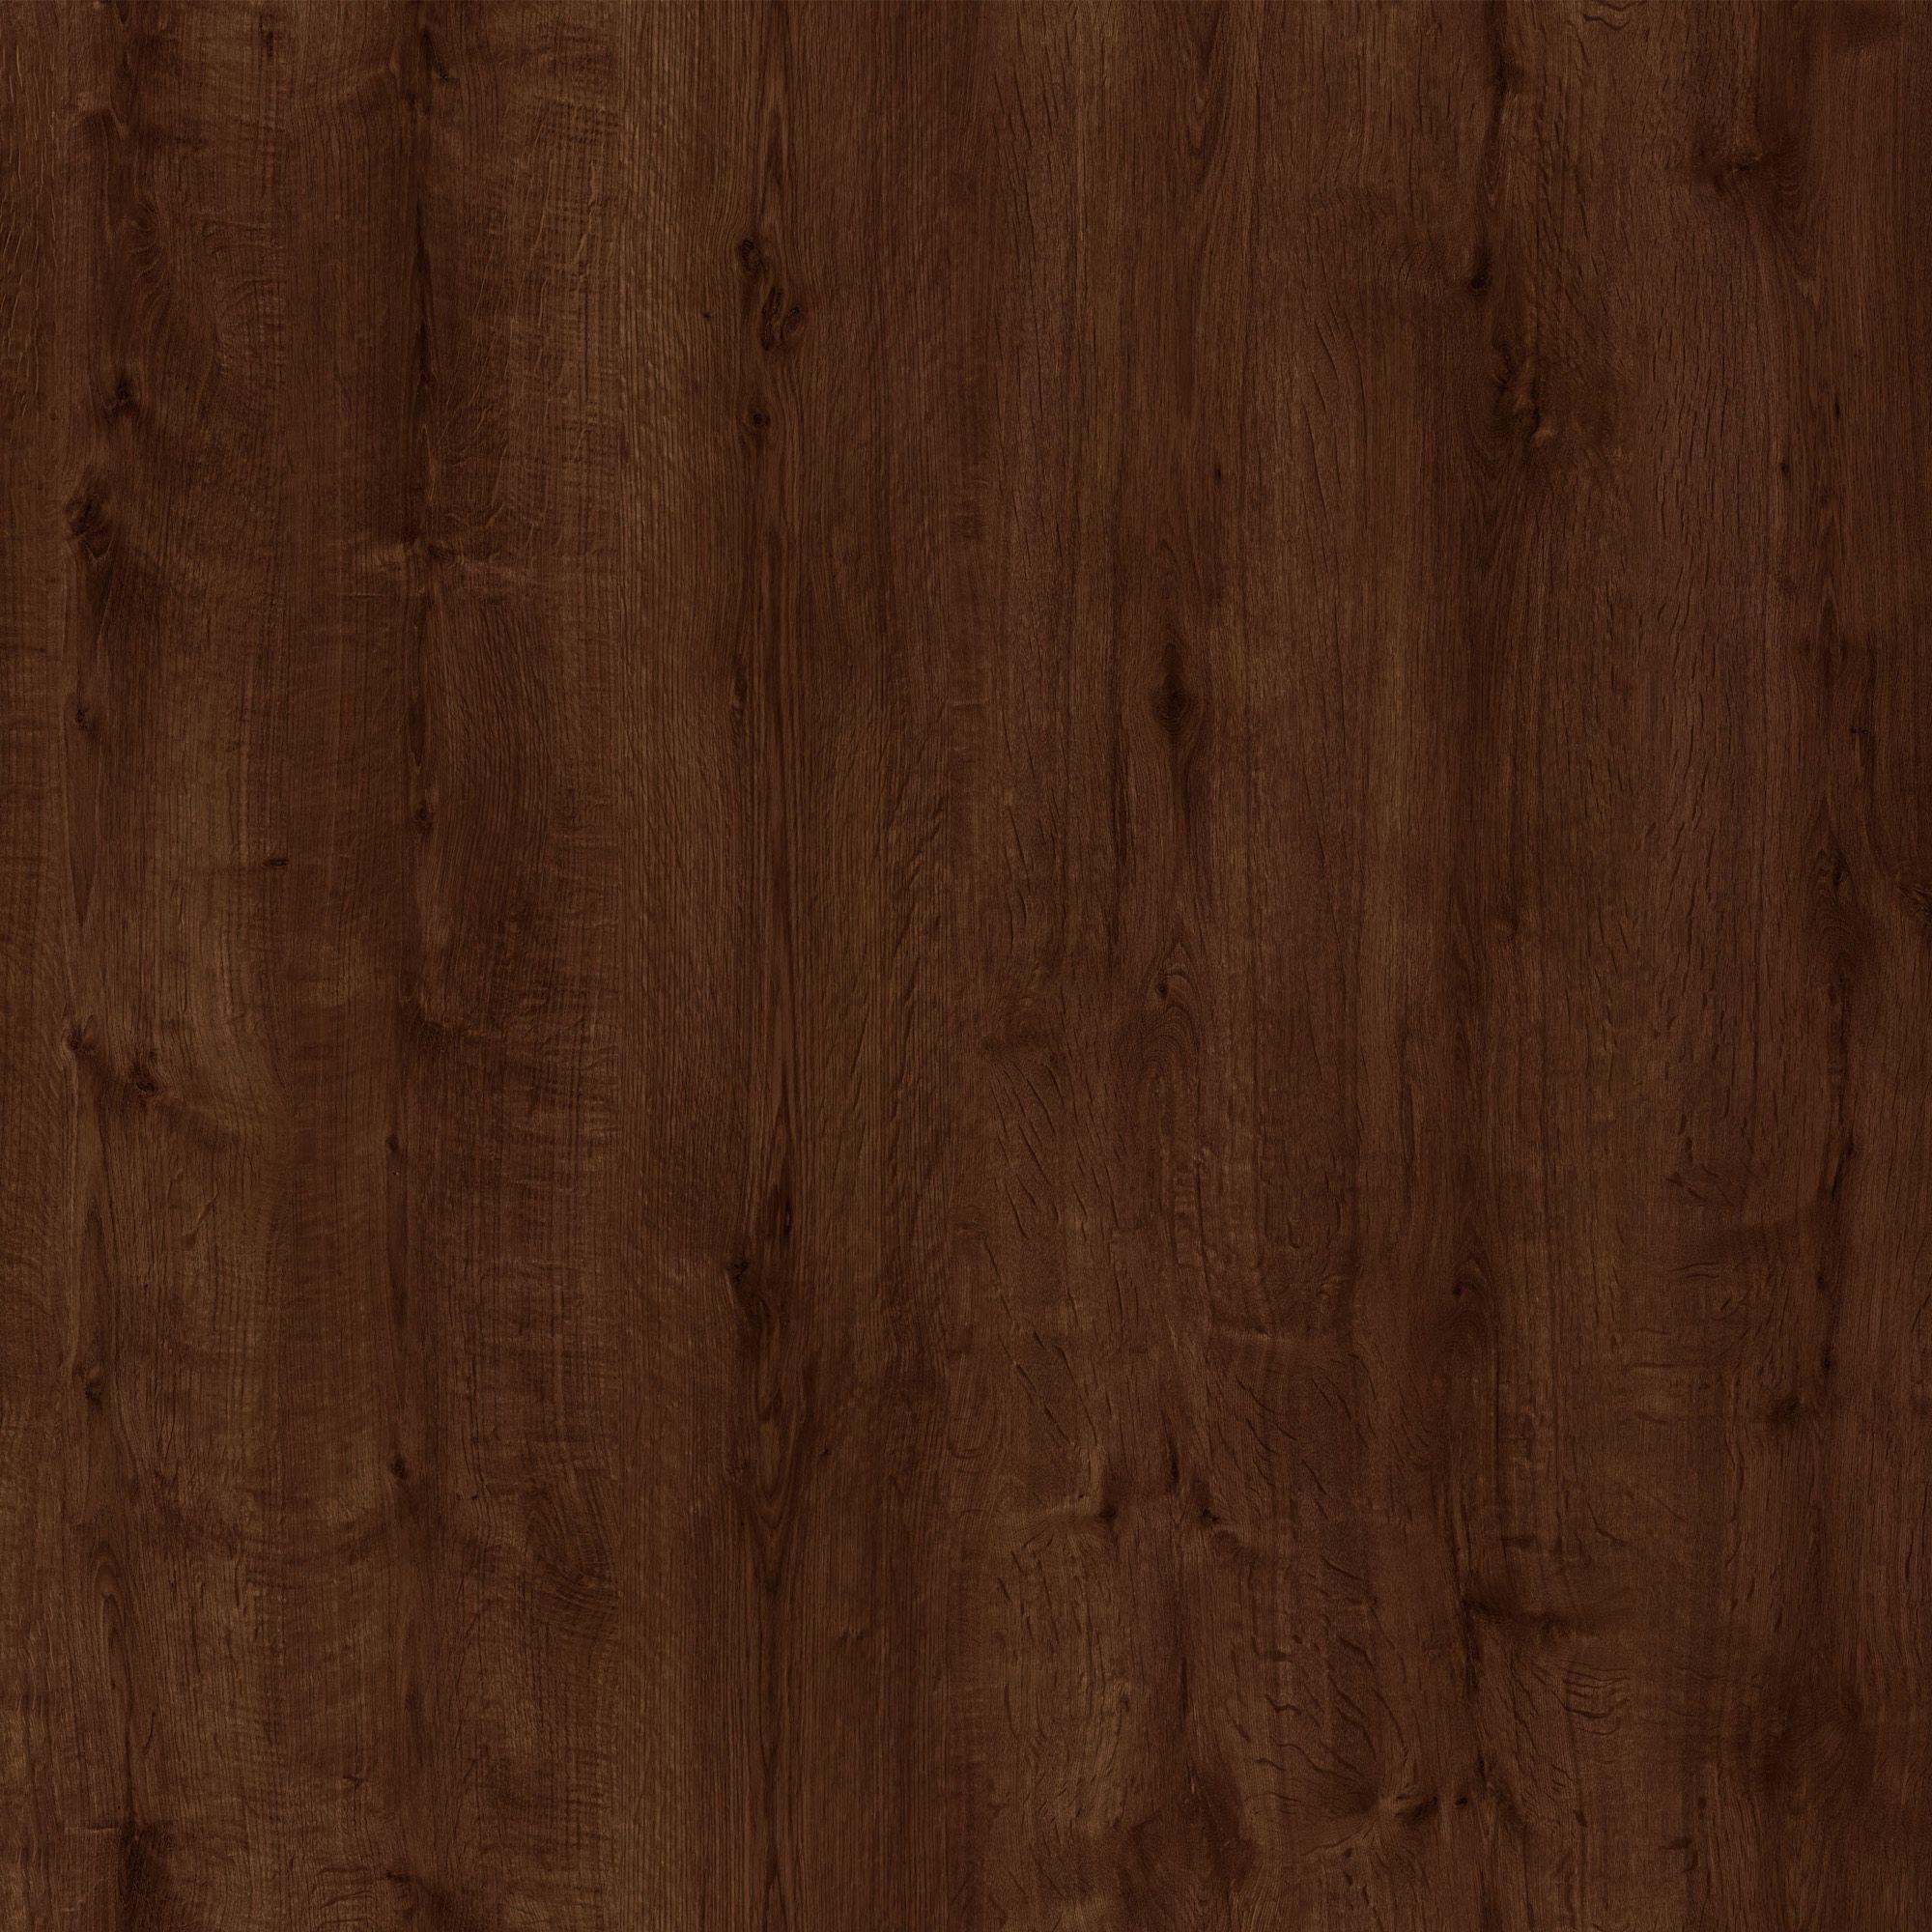 Concertino Prestige Dark Oak Effect Laminate Flooring 1 48 M² Pack